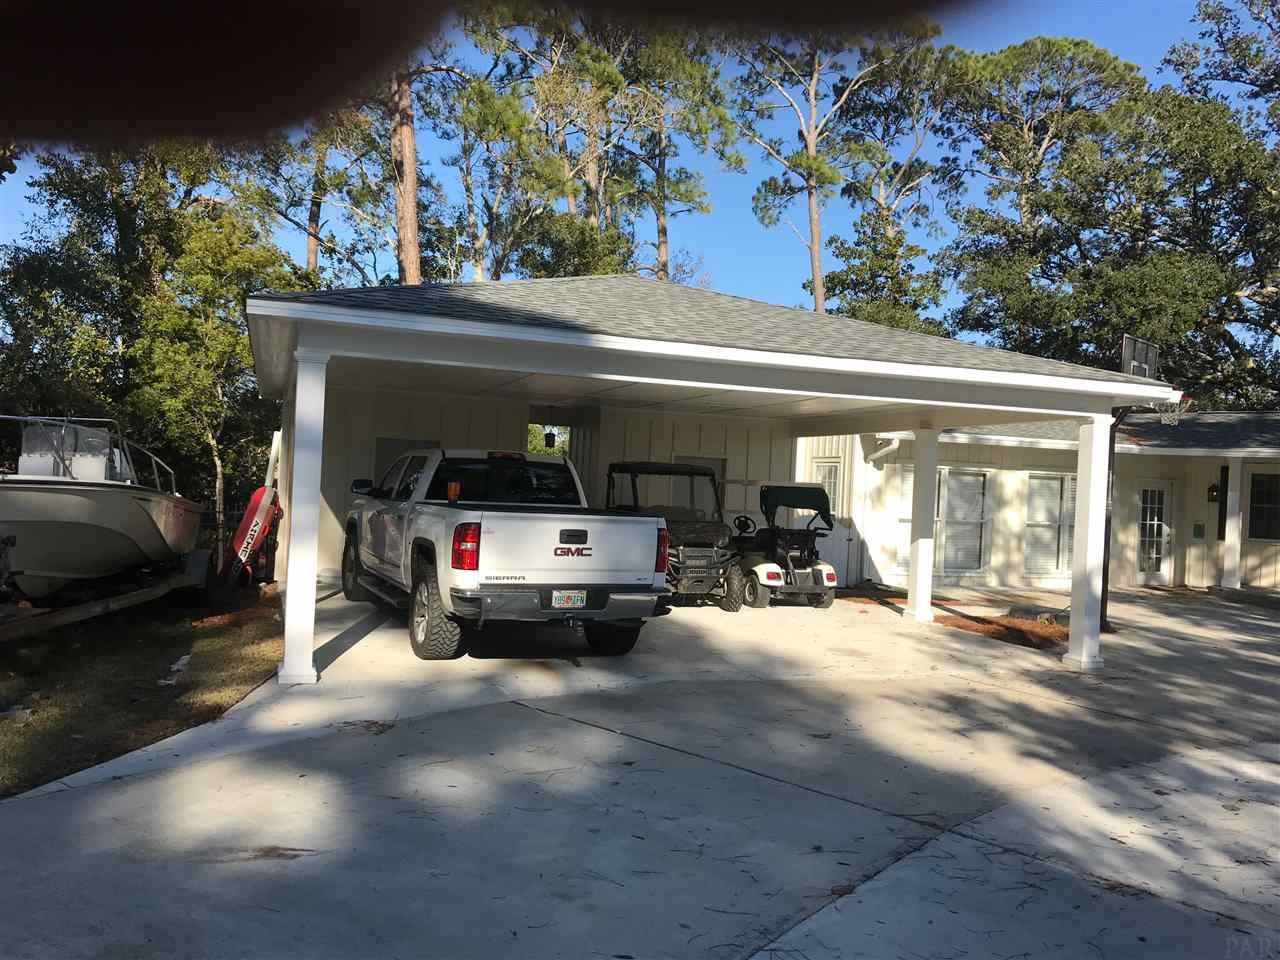 32 Star Lake Dr, Pensacola, FL 32507